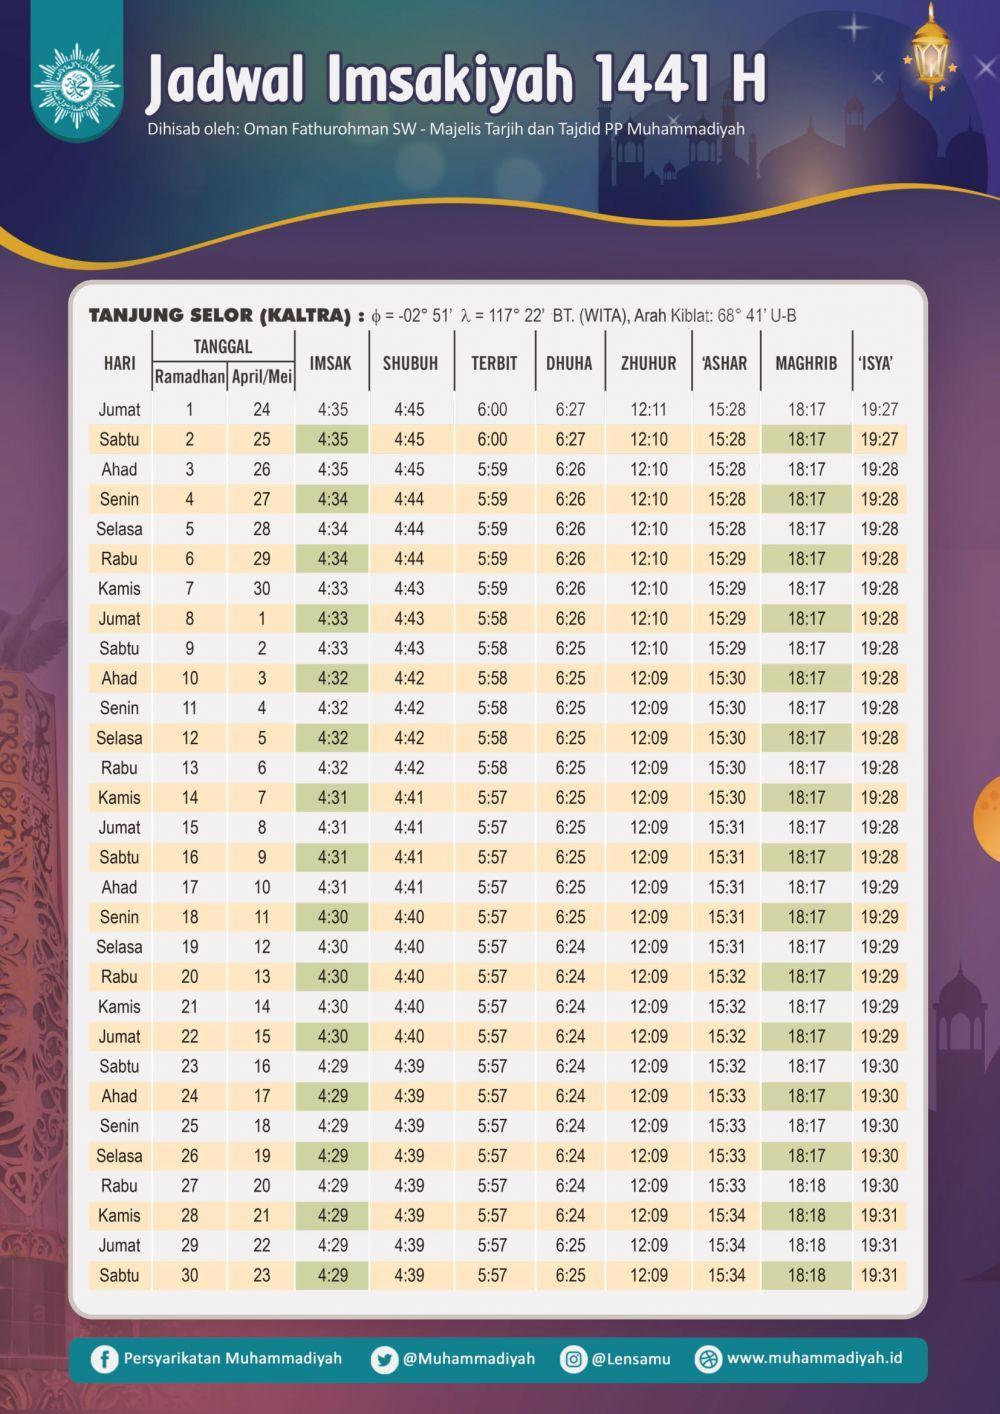 Jadwal Imsakiyah dan Buka Puasa Ramadan 1441 H/2020 M, Tanjung Selor